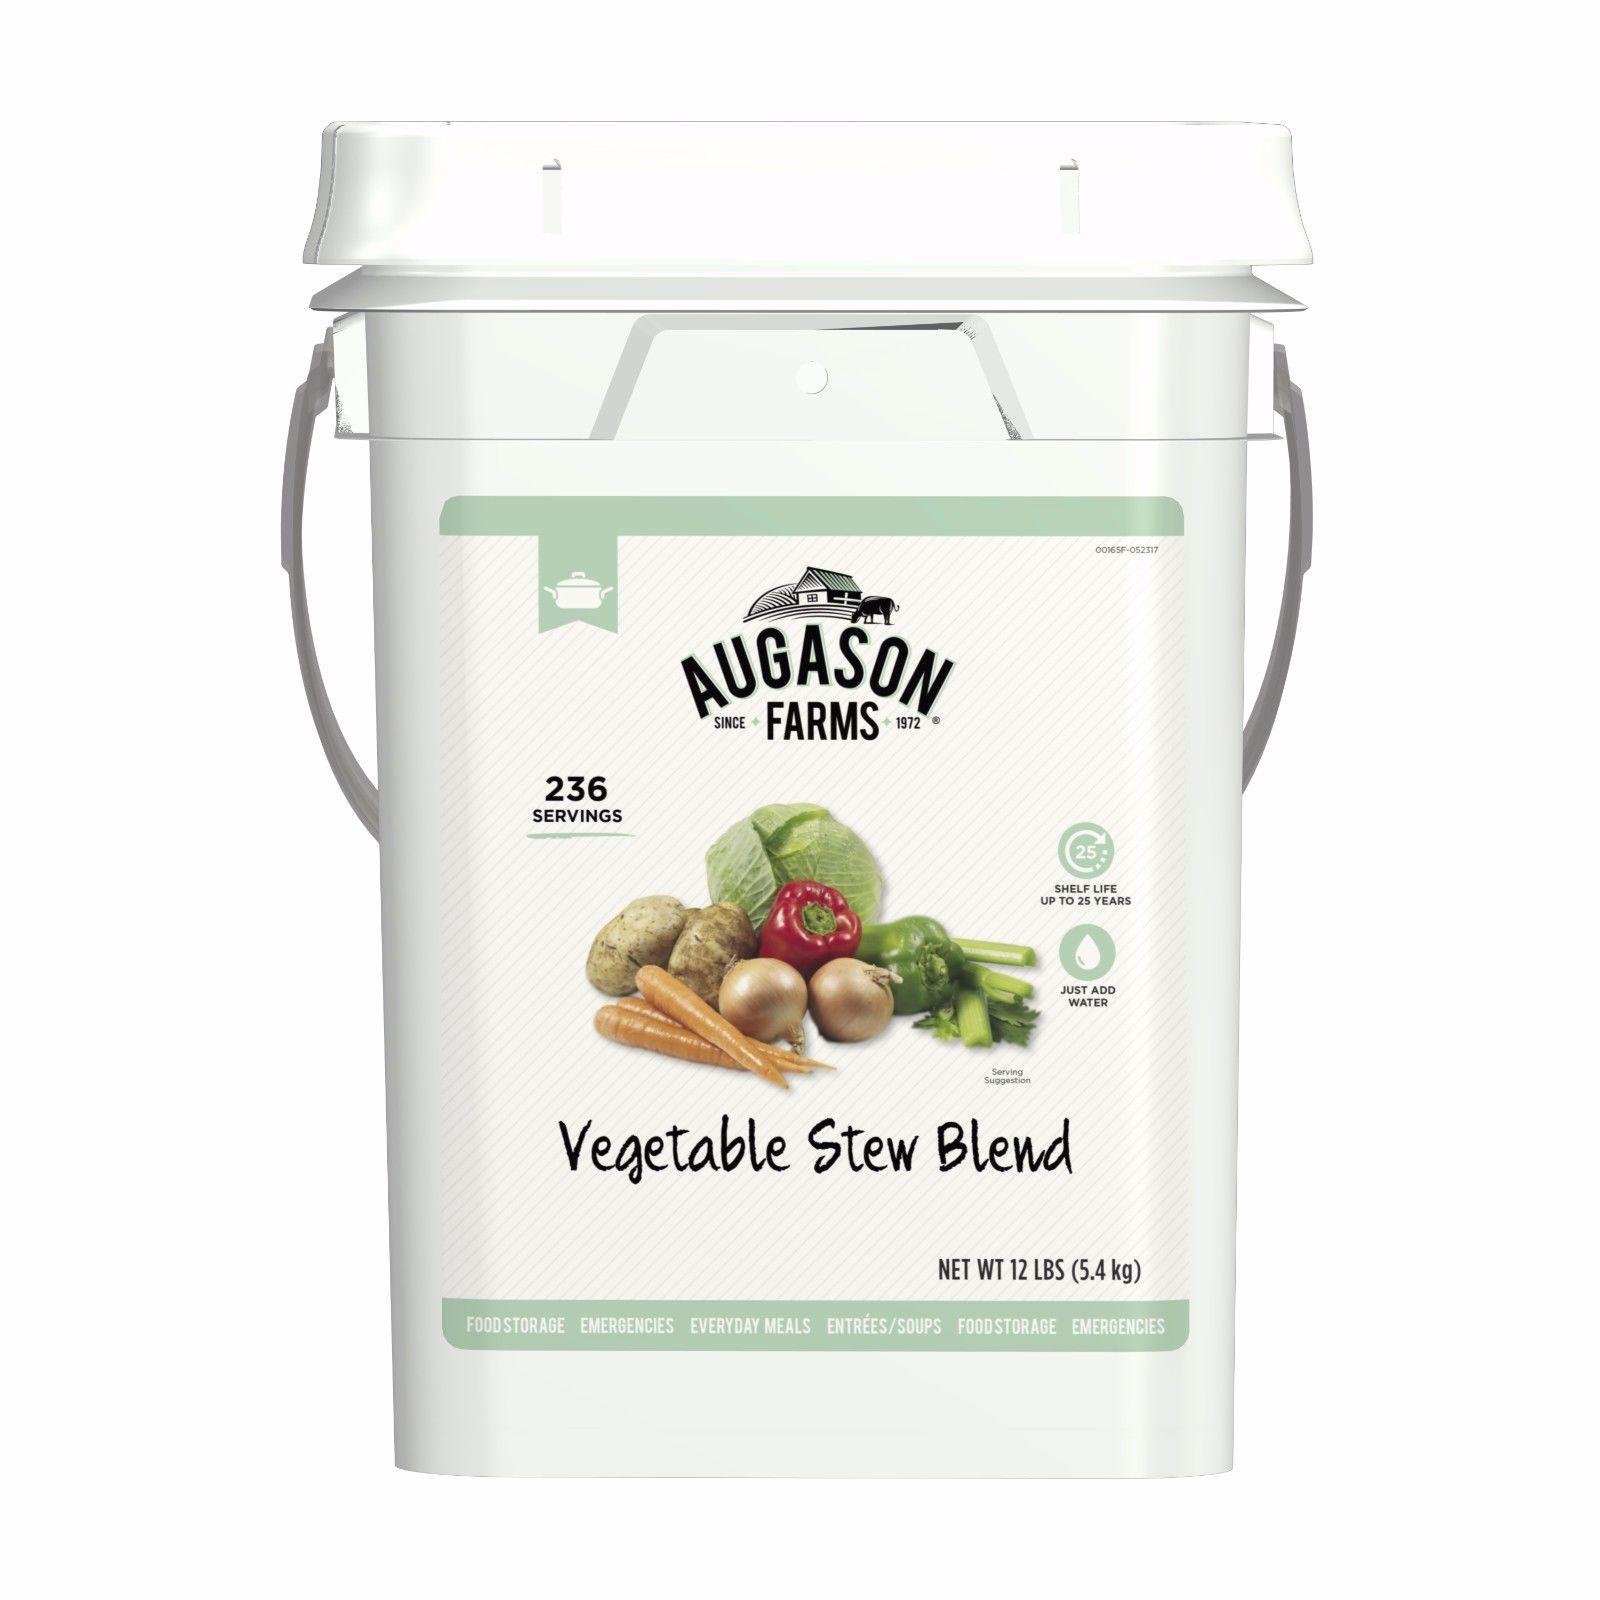 Augason Farms Vegetable Stew Gluten Free Emergency Food Storage 4-Gal Pail 1